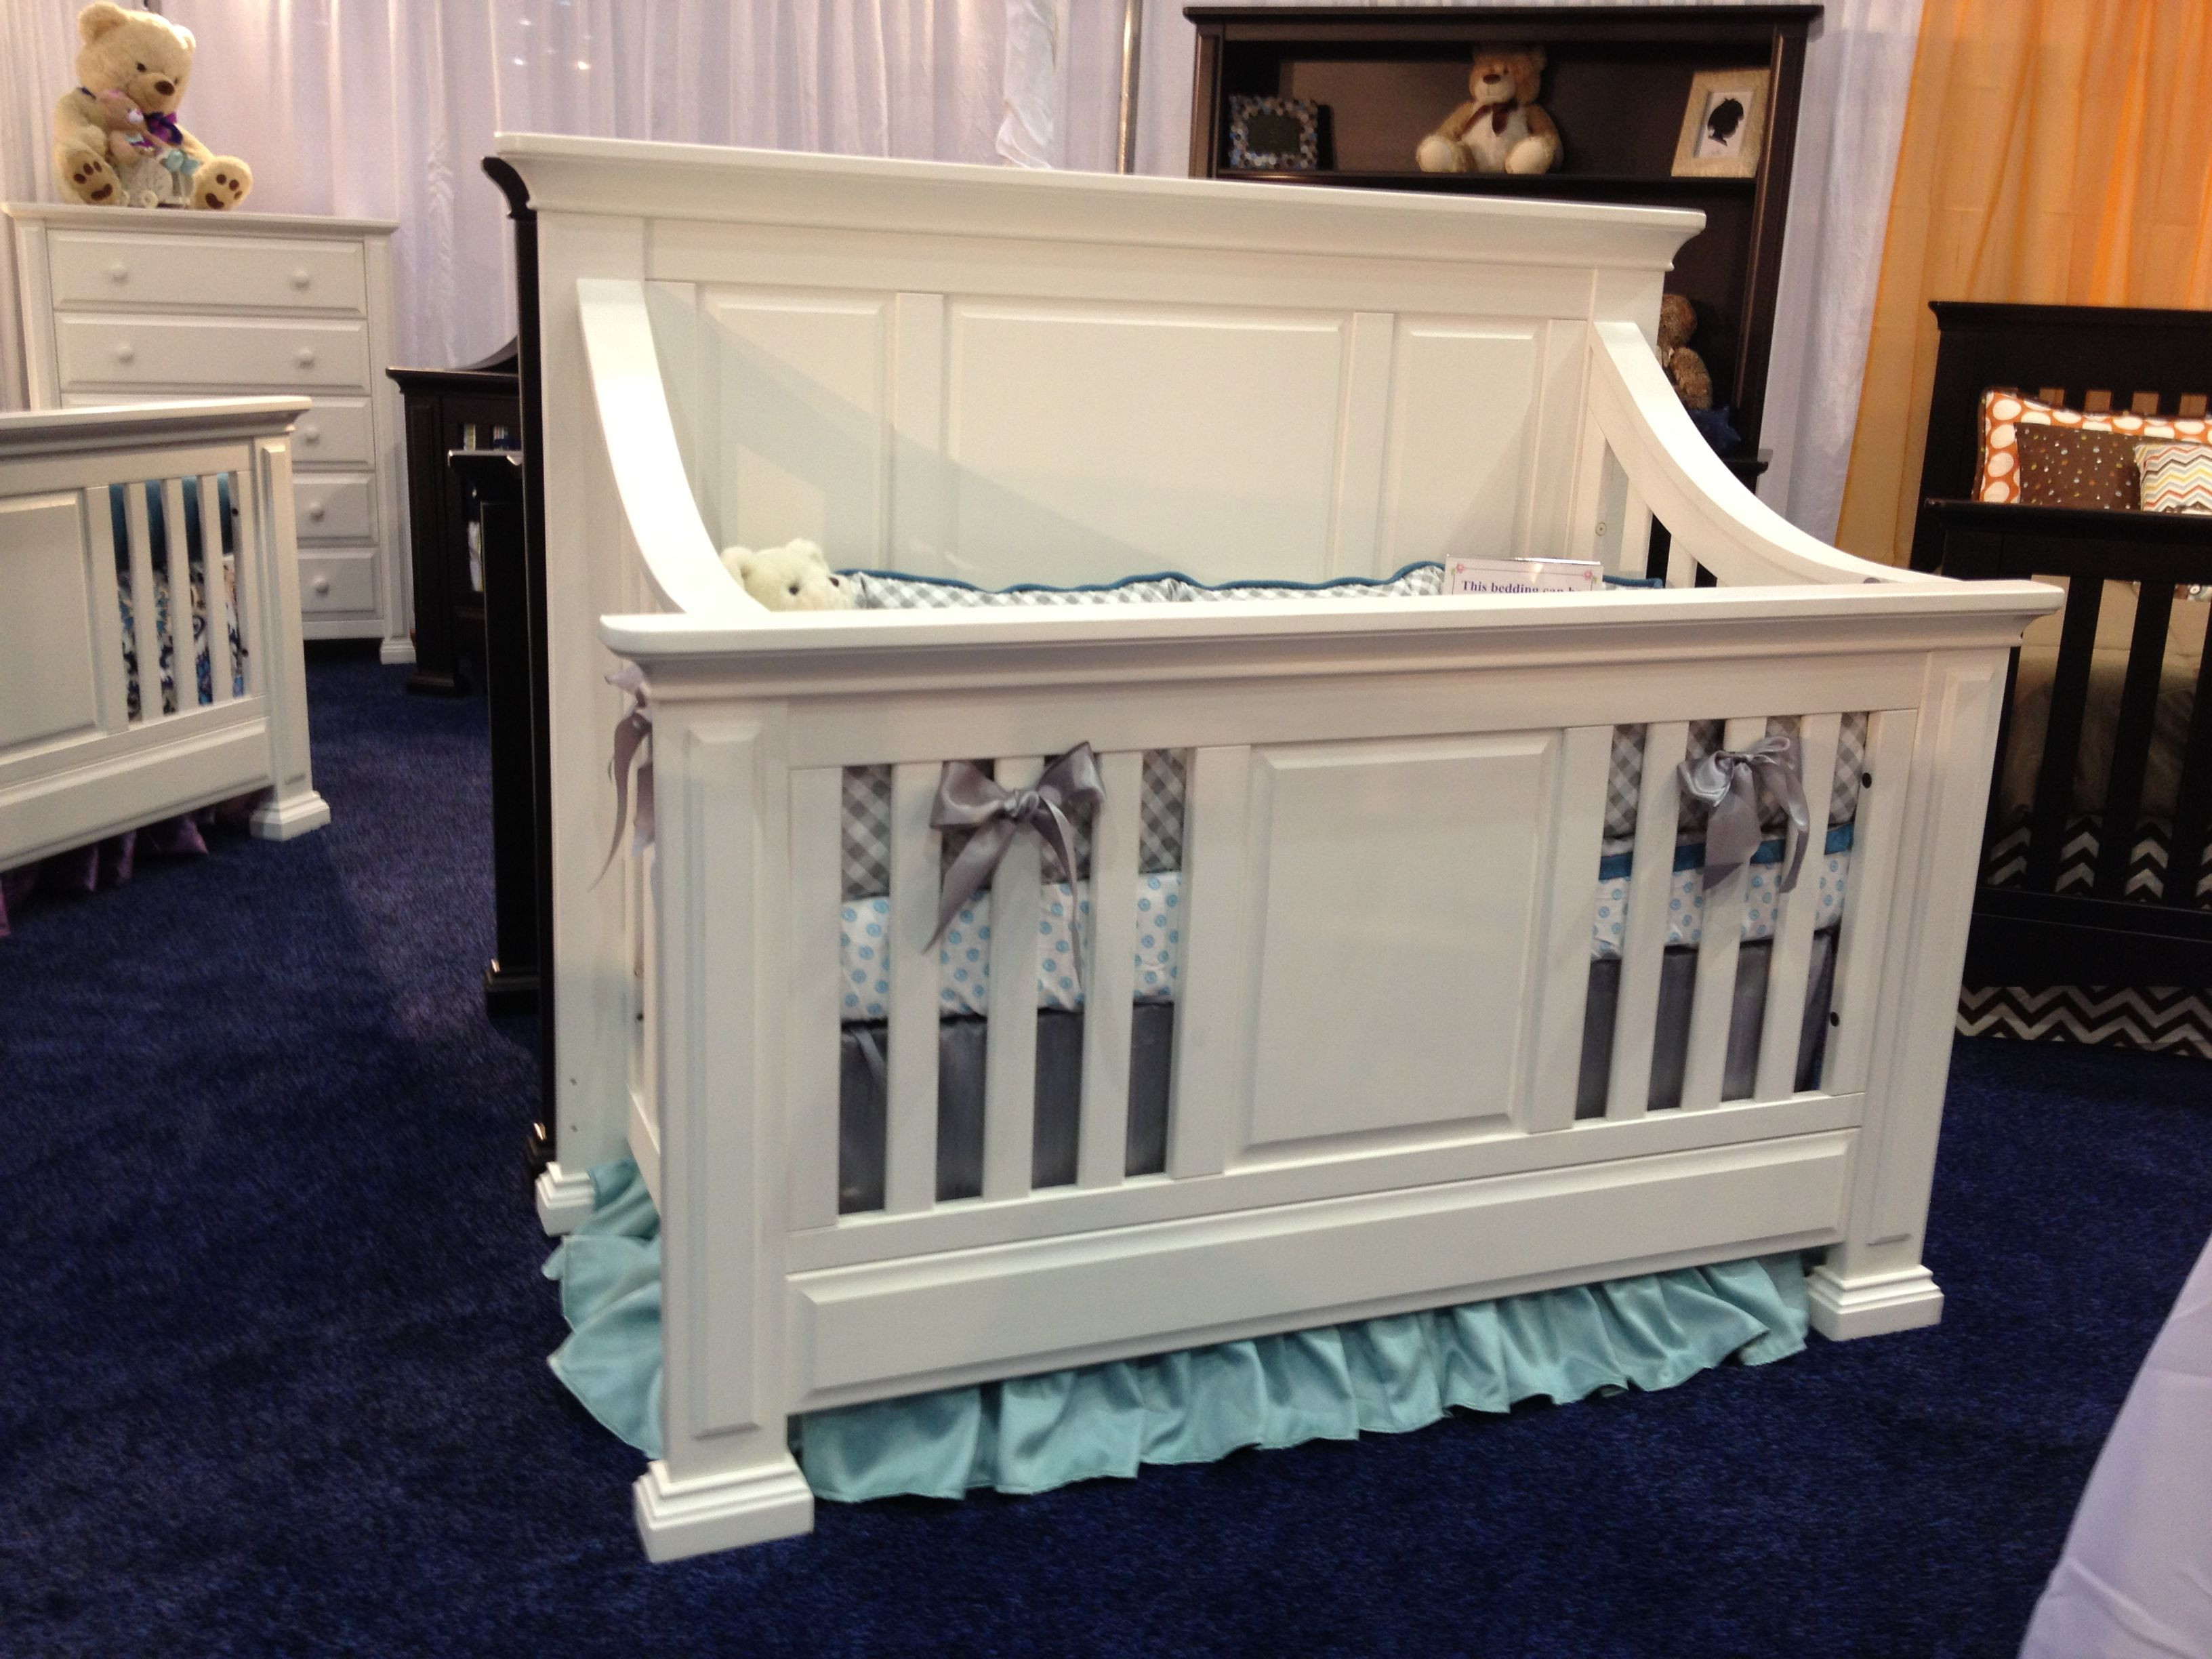 crib on convertible in evolur baby cribs dream pin s santa fe antique mist me